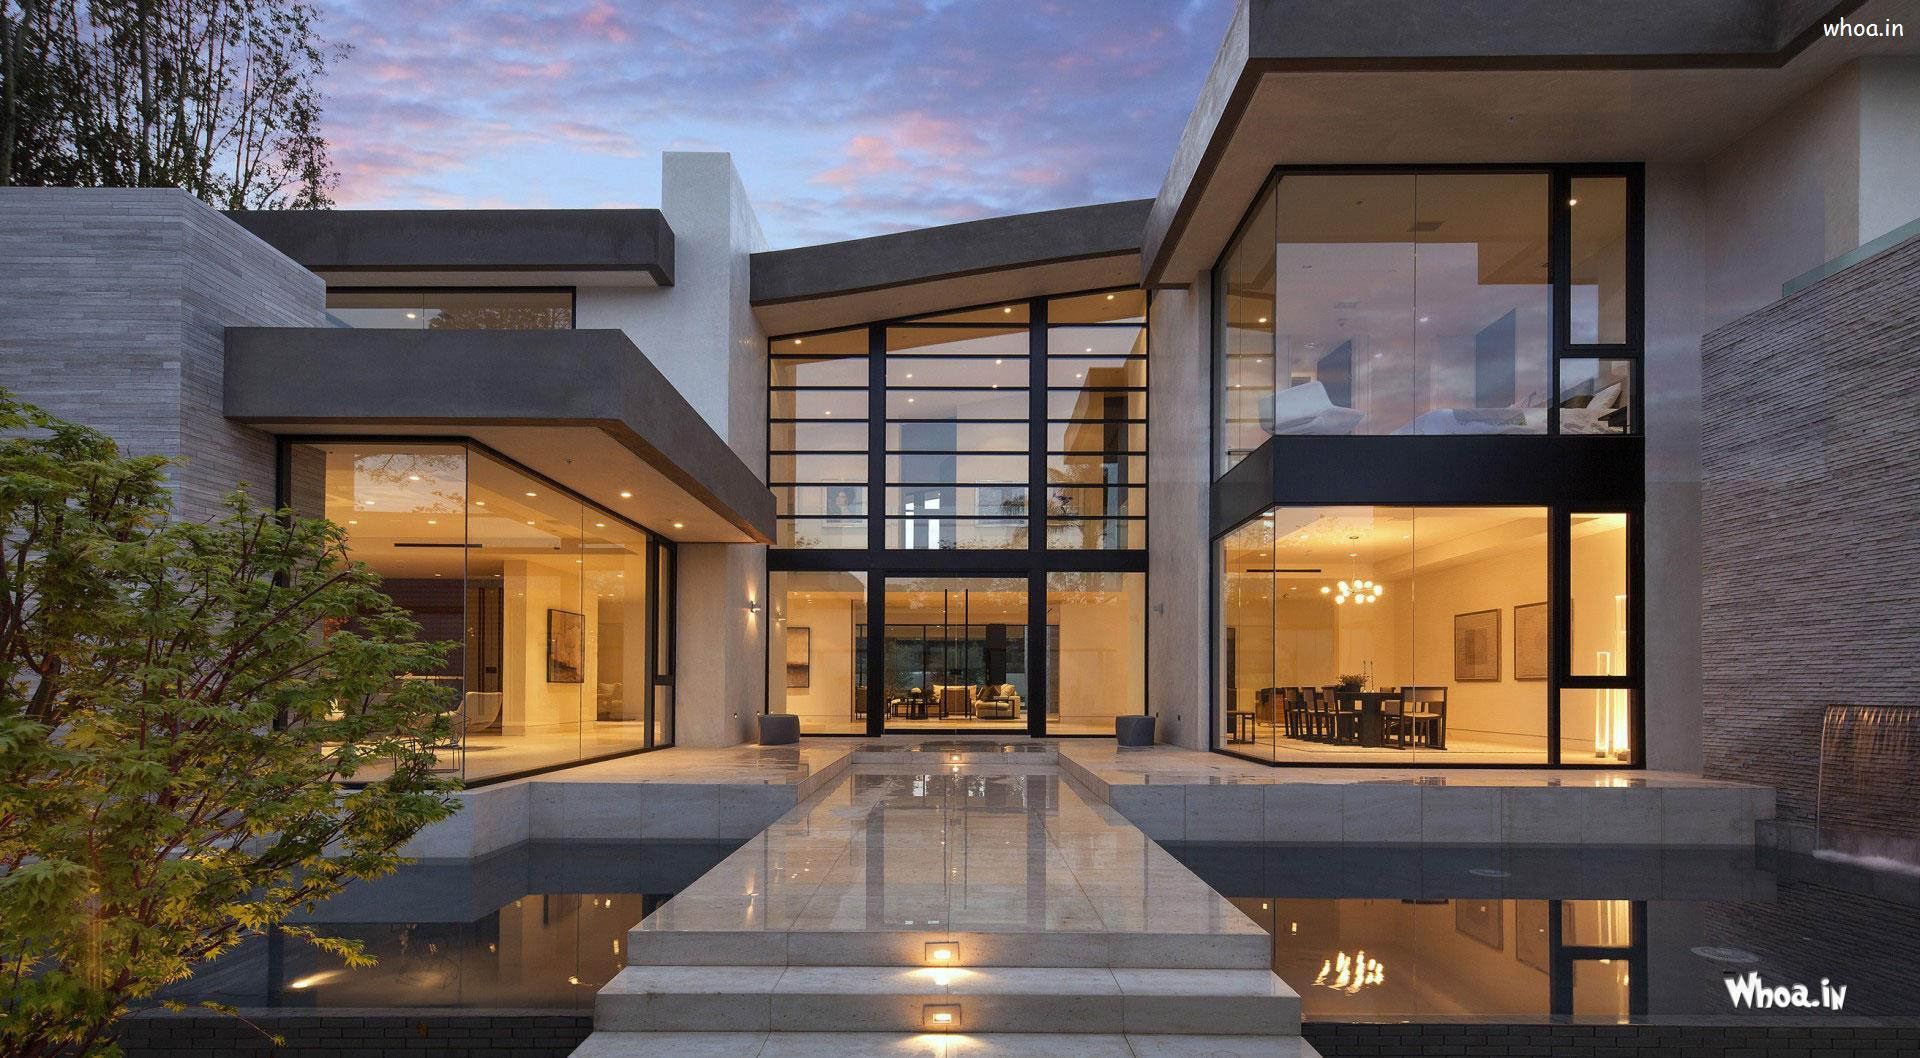 Amazing Modern House Designs HD Wallpaper